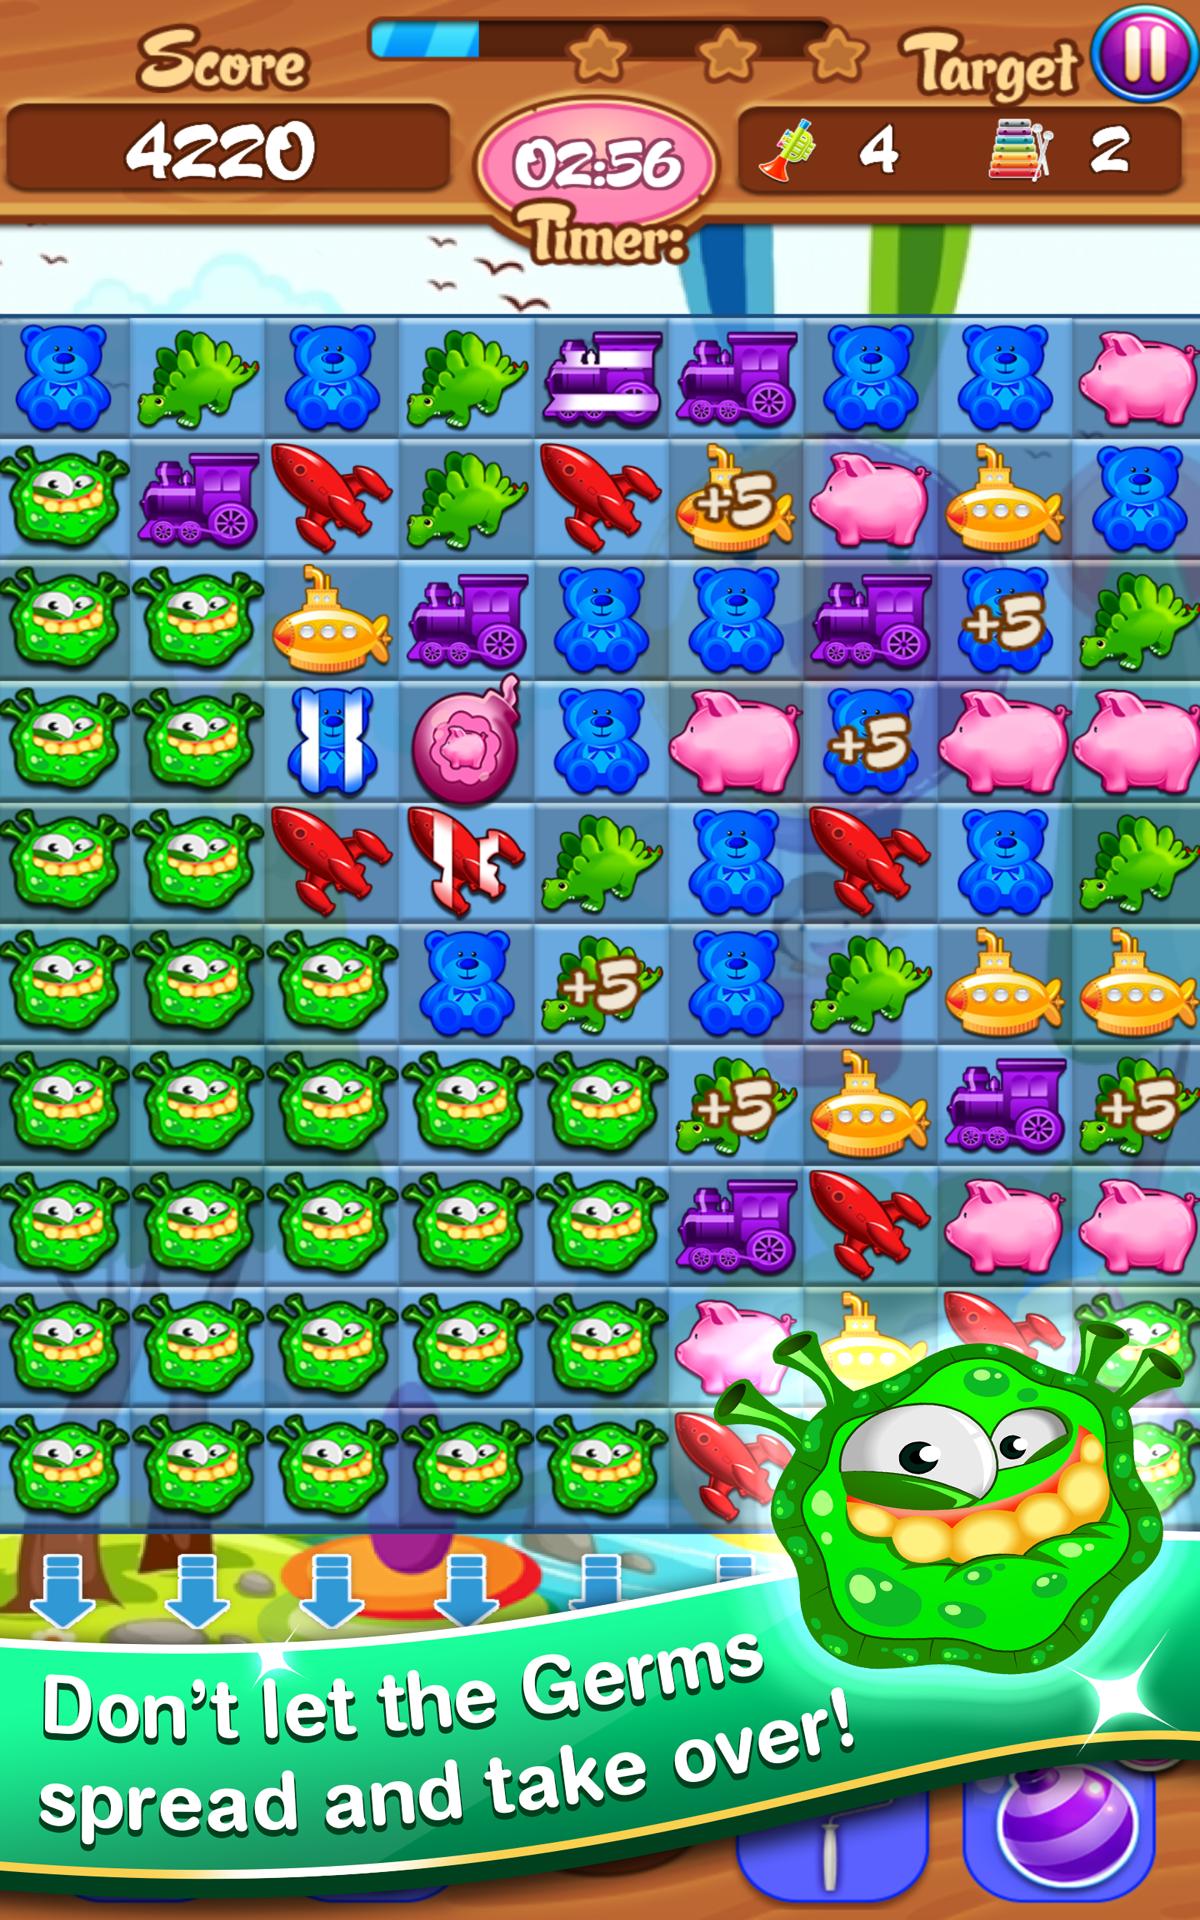 Toy Blast Kindle : Toy match blast mania amazon appstore